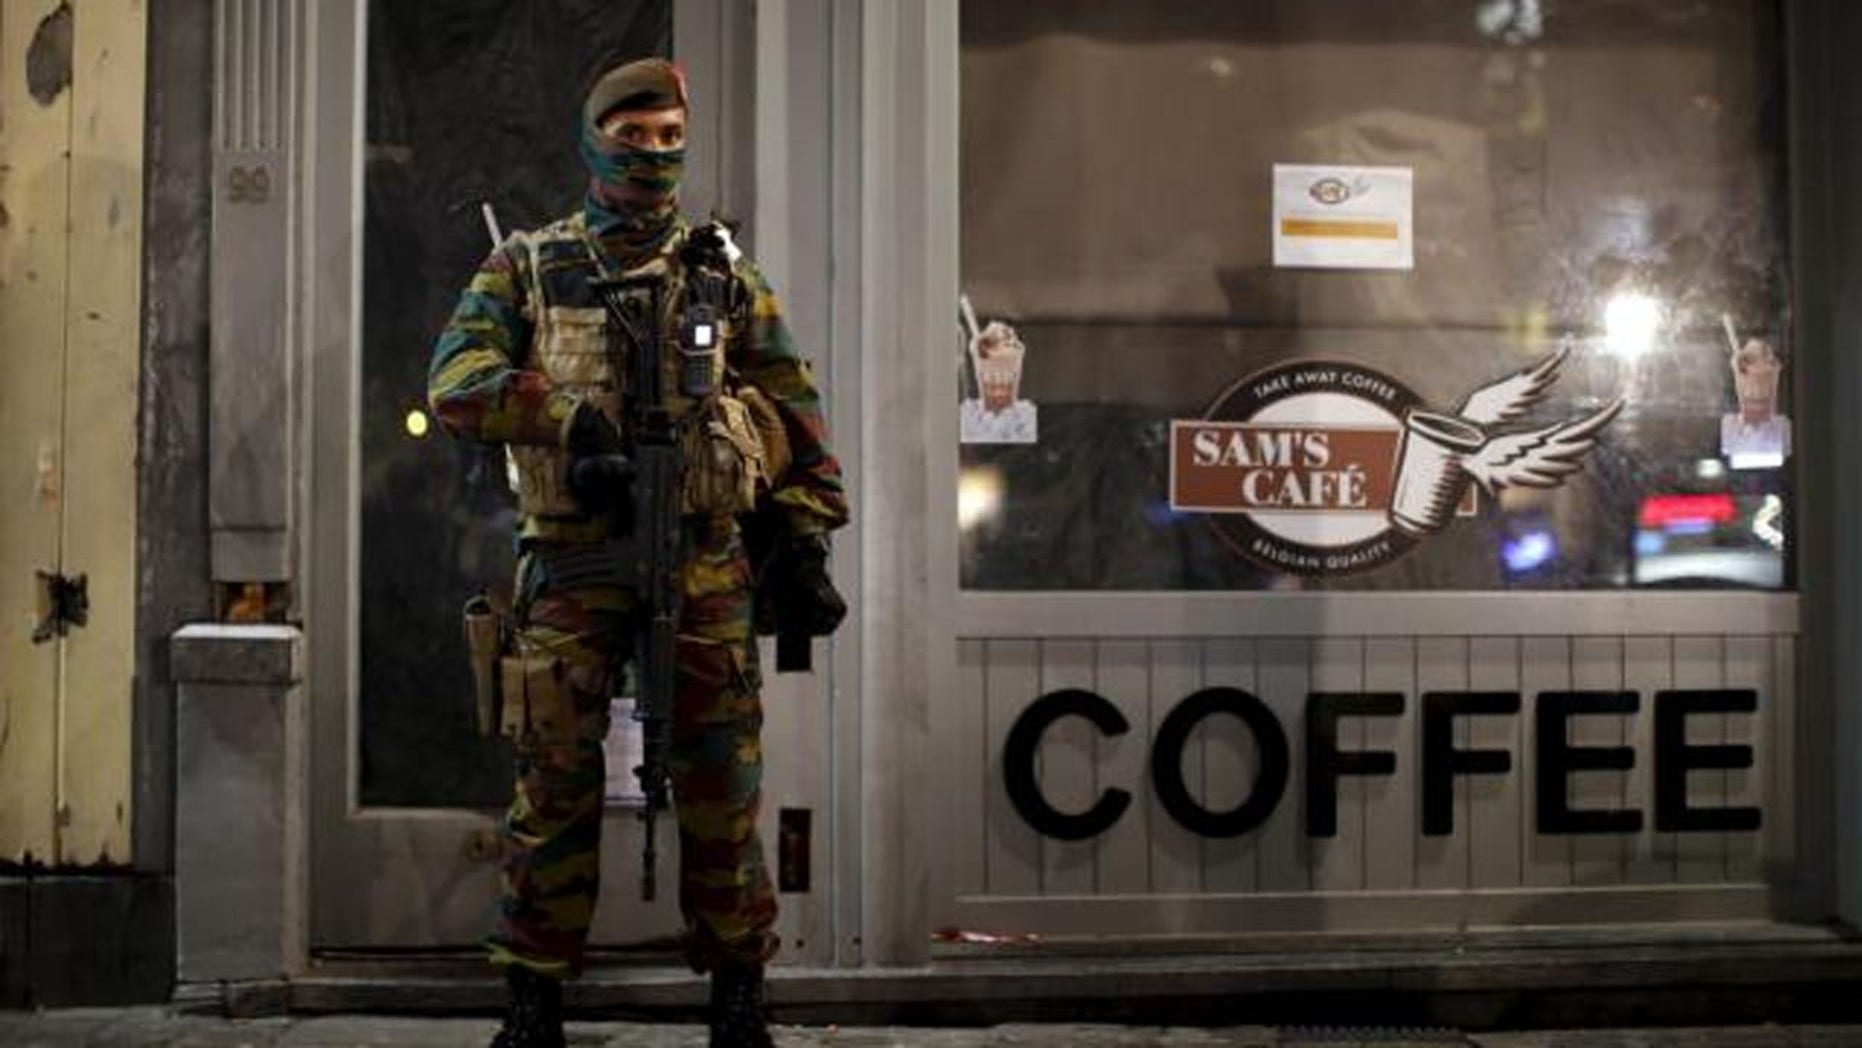 Belgian soldiers patrol in central Brussels as the city is on lockdown.